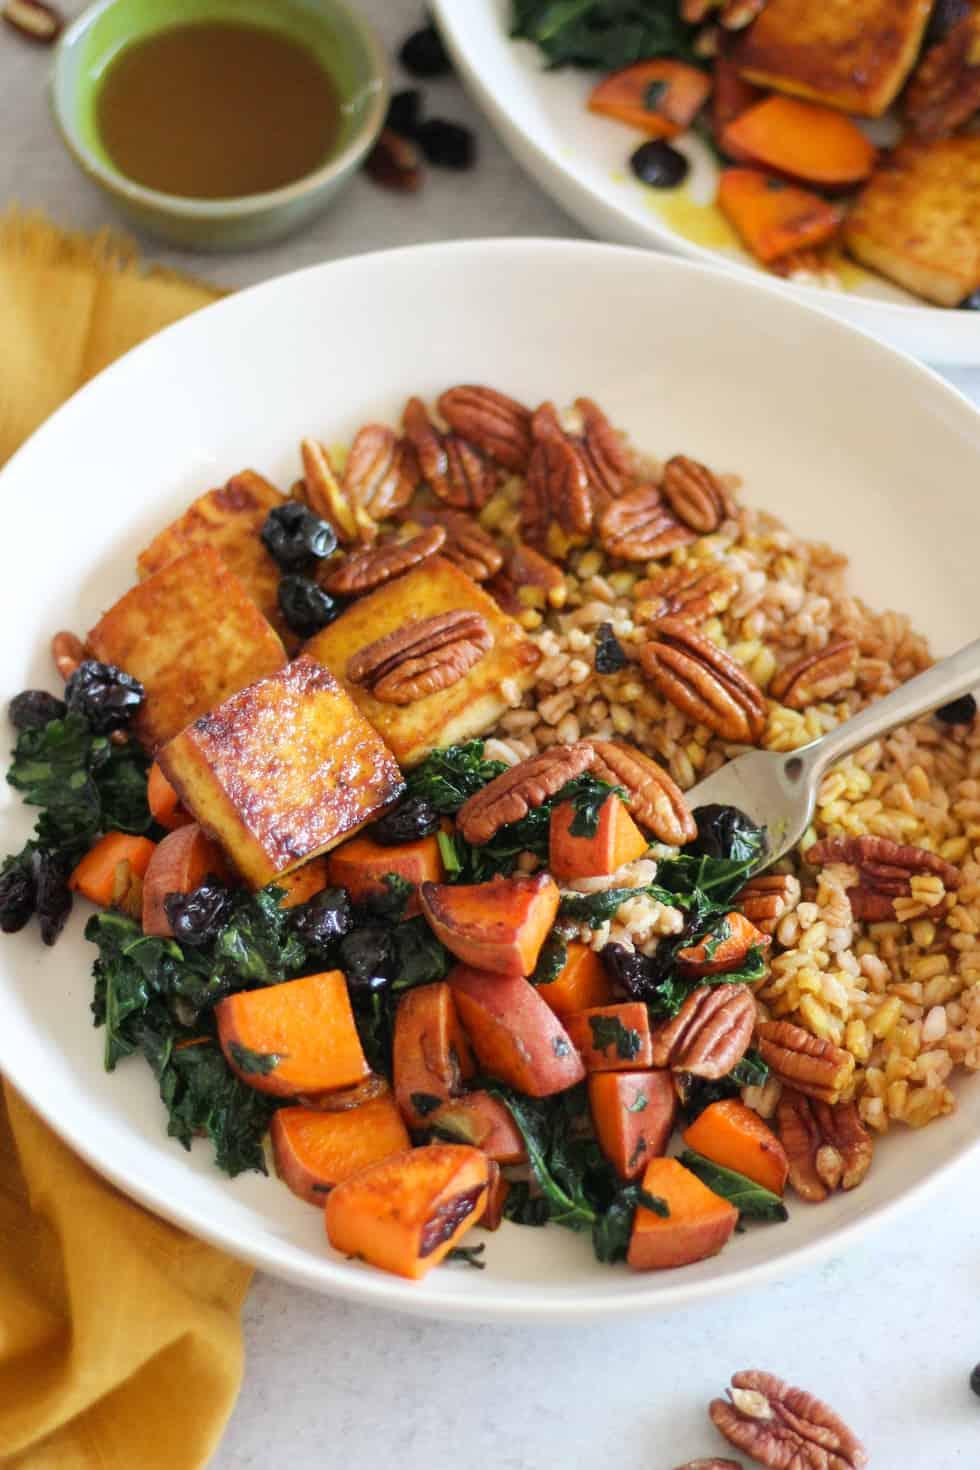 Thanksgiving leftovers in Baked Tofu Harvest Bowls.